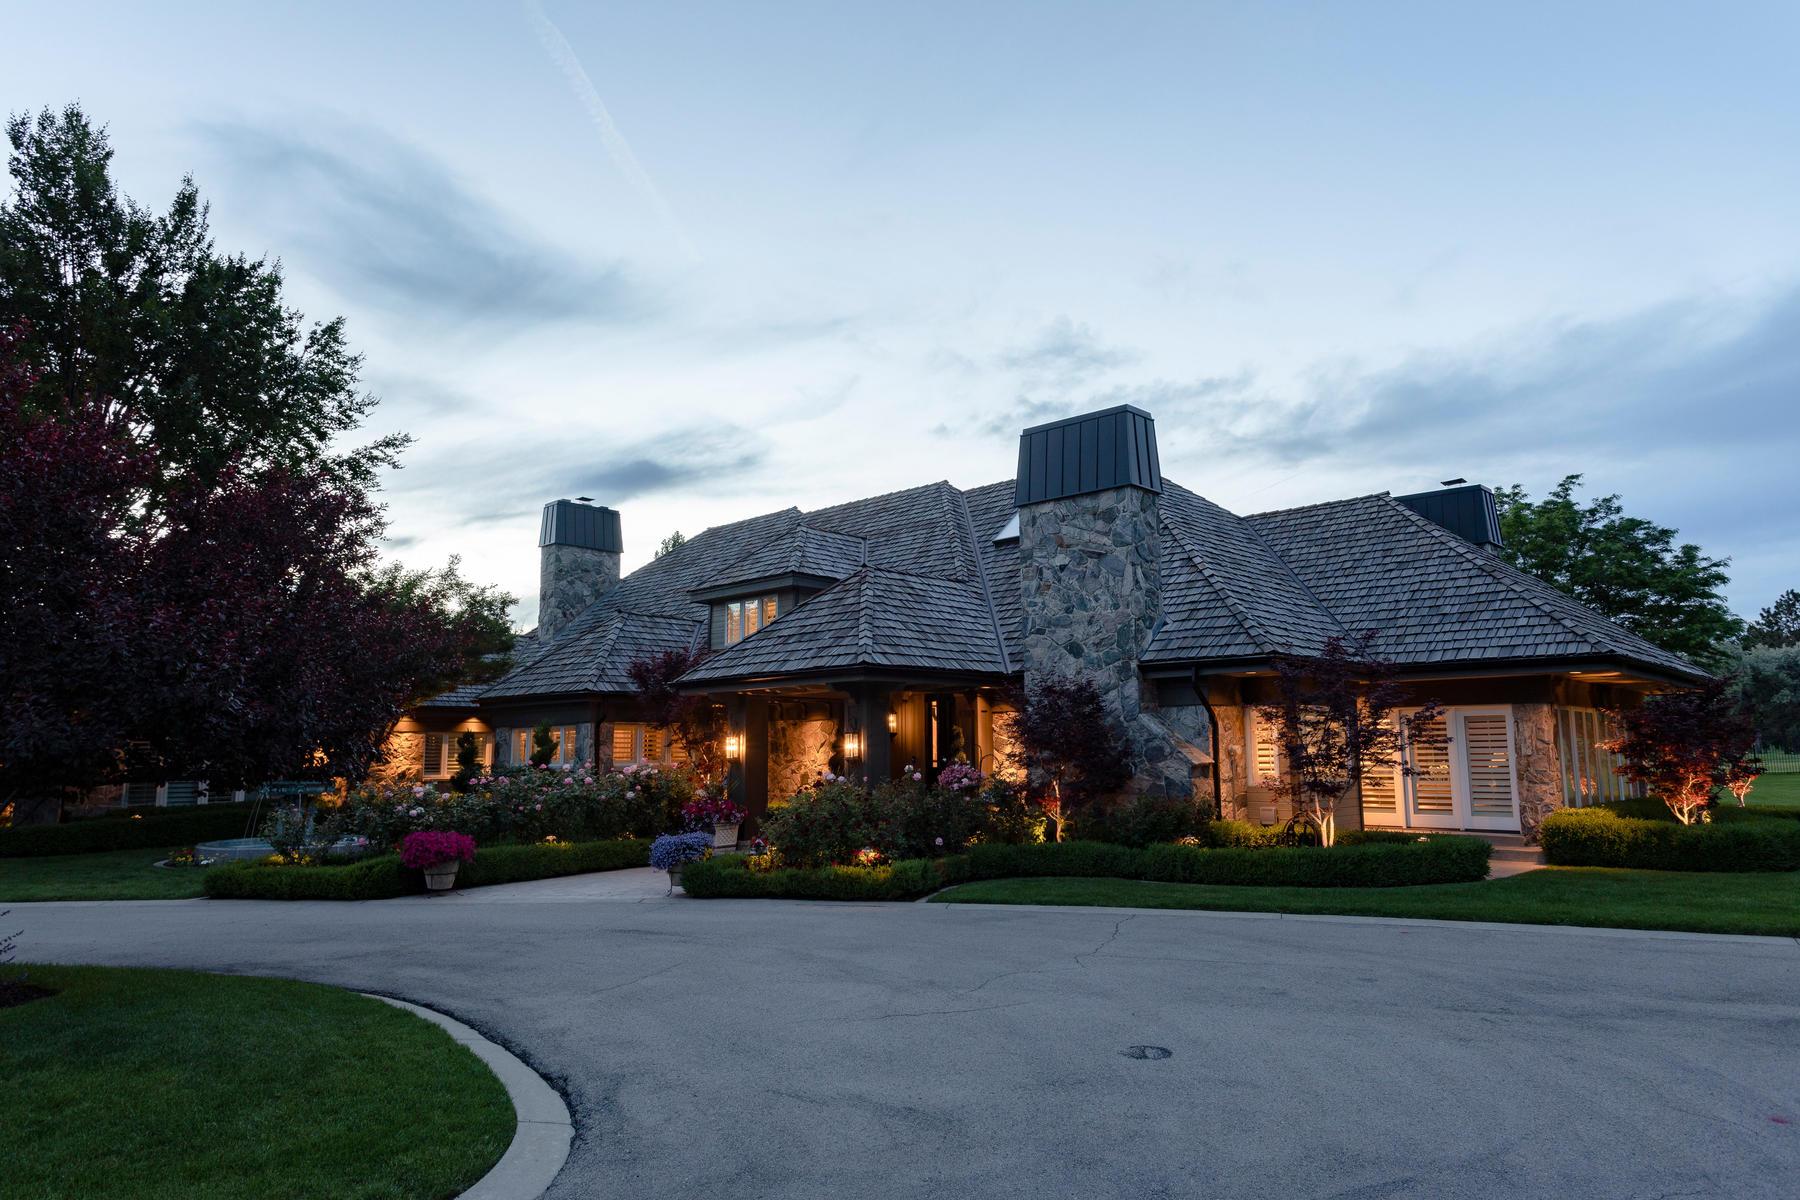 Single Family Homes for Sale at Elegant 2 Acre Estate 12108 S Pendleton Cir, Draper, Utah 84020 United States